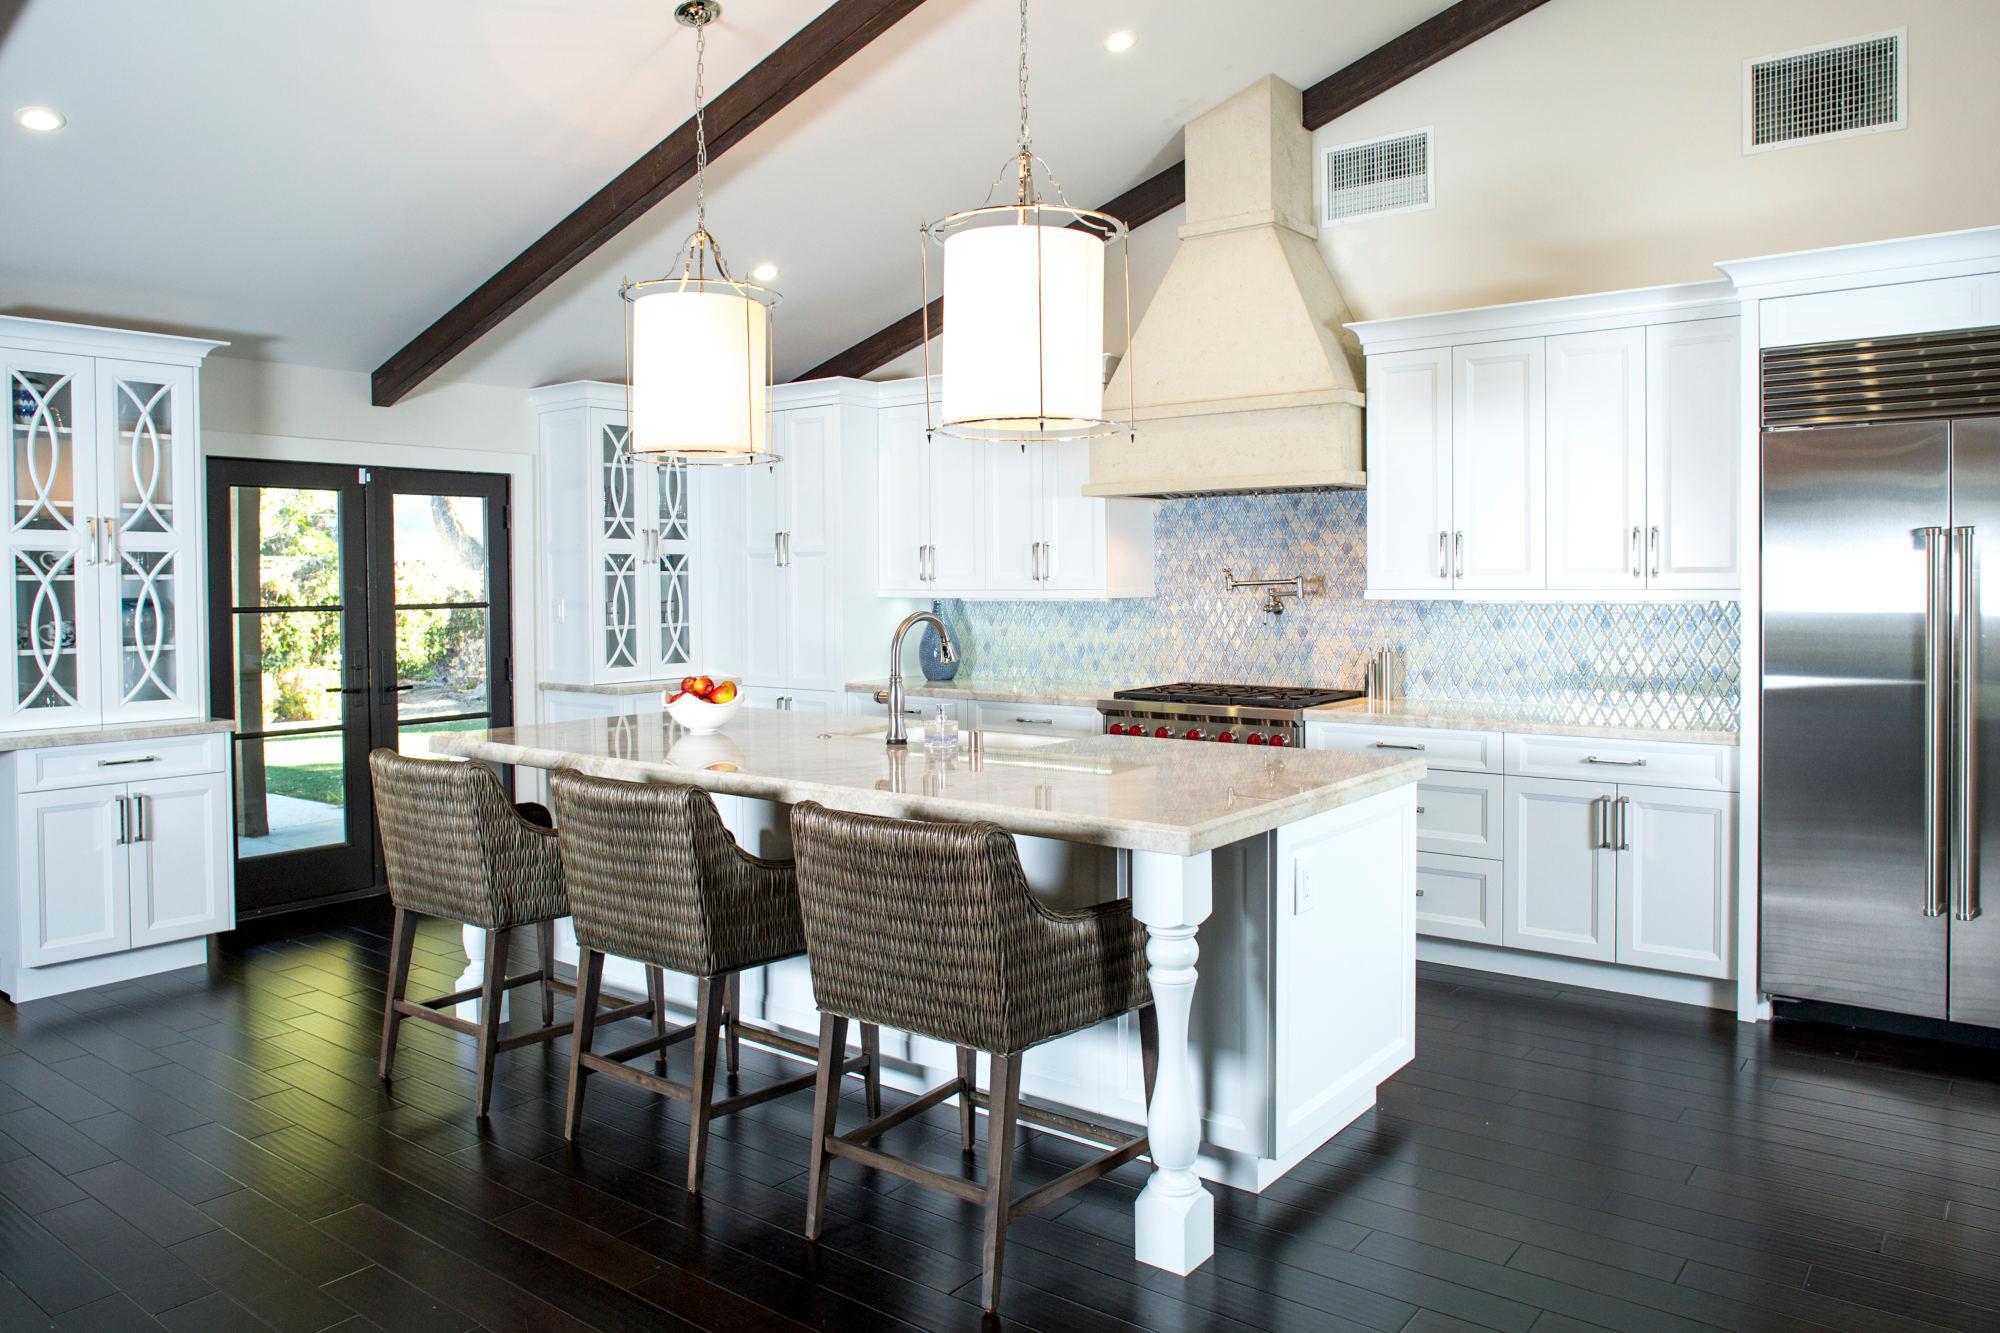 Santa Barbara styled white kitchen, mullion cabinets, large island with quartzite beige countertops.